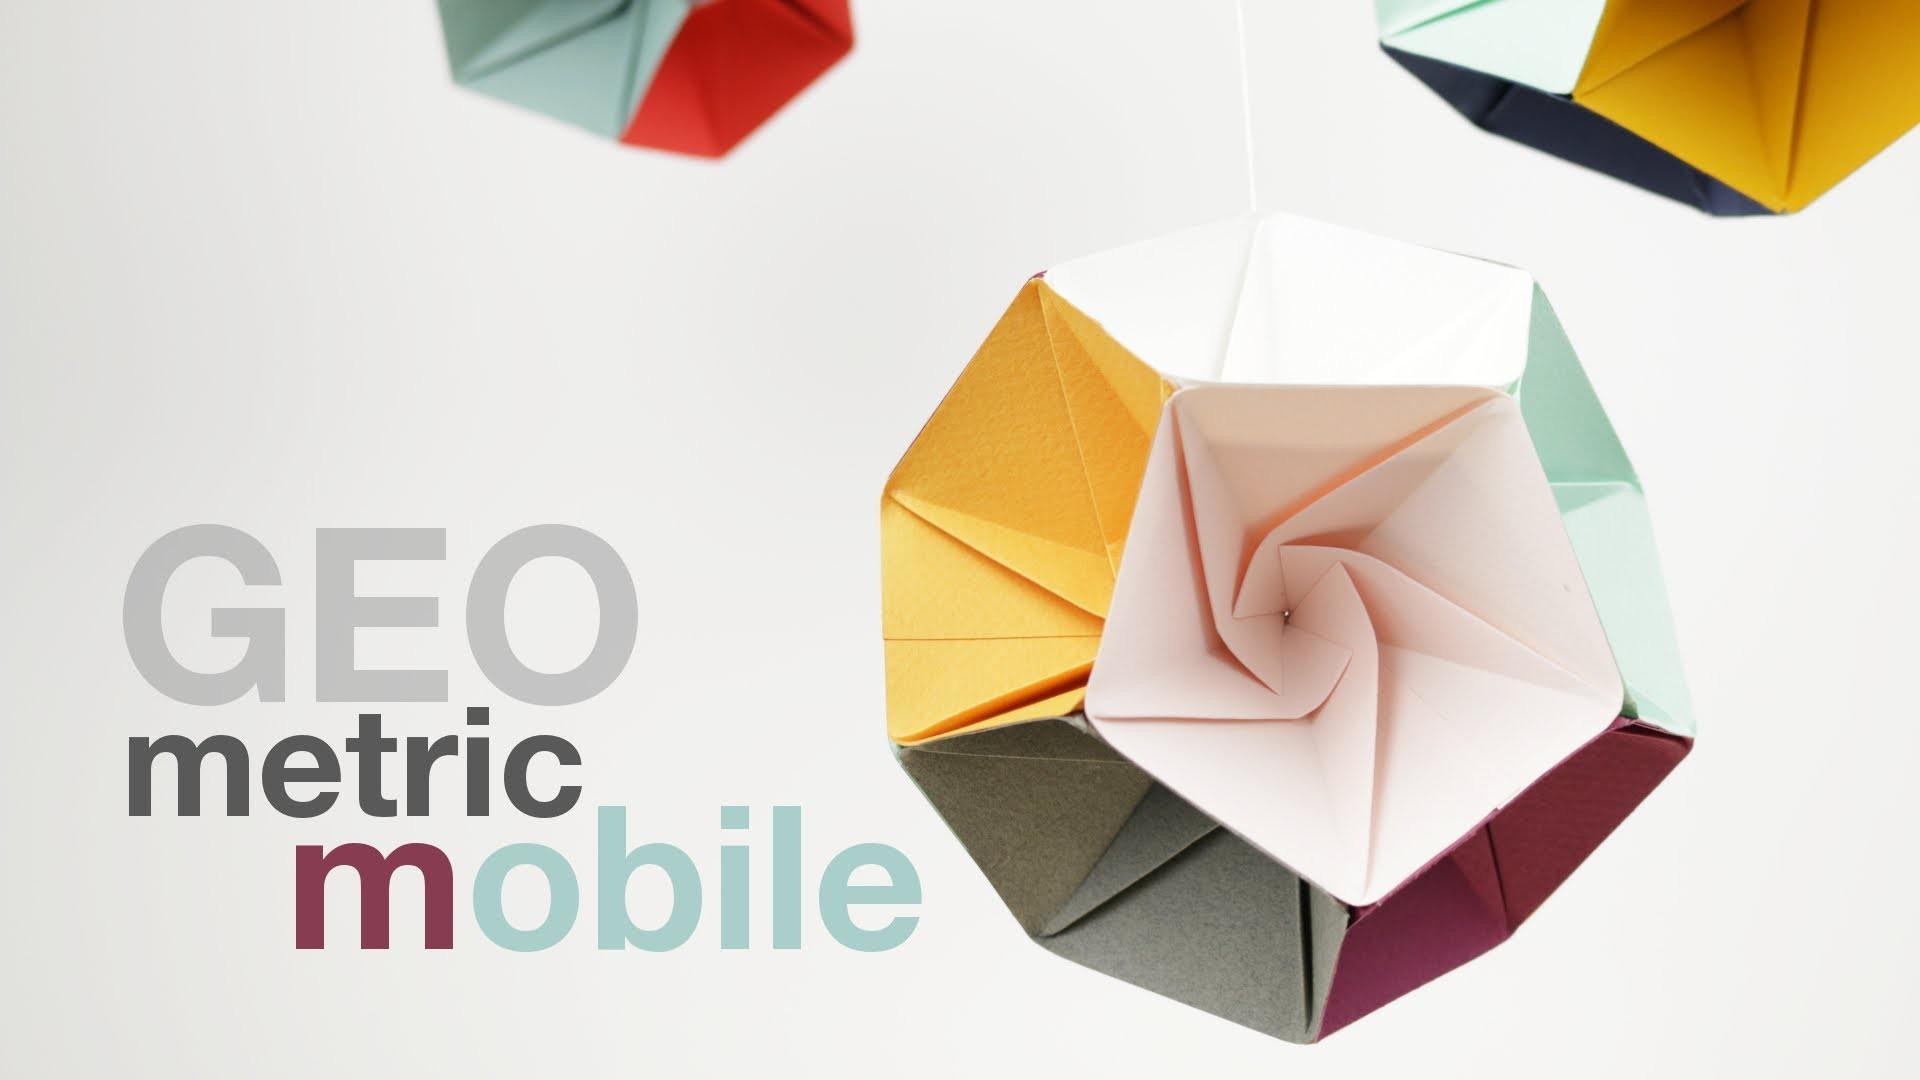 How to make a Geometric Mobile (DIY Tutorial)